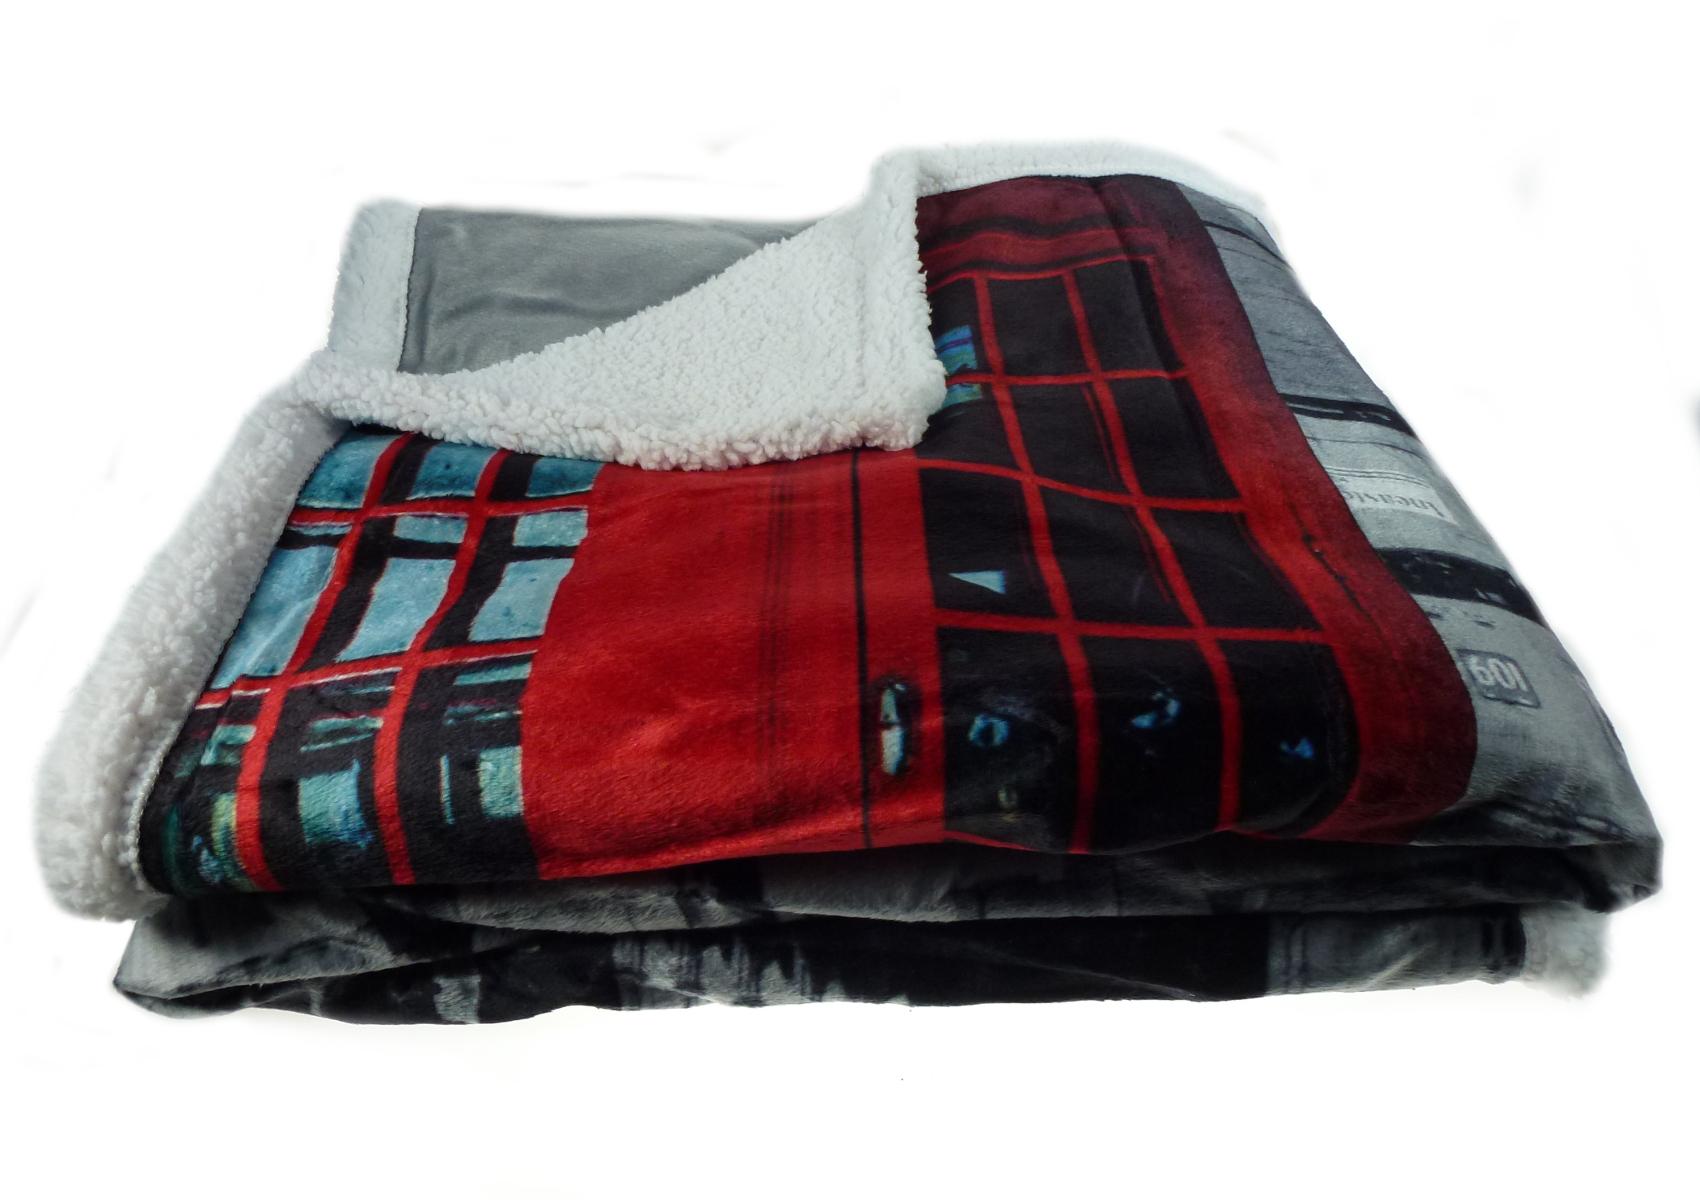 London big ben phone box blanket soft sherpa fleece for Sherpa blanket